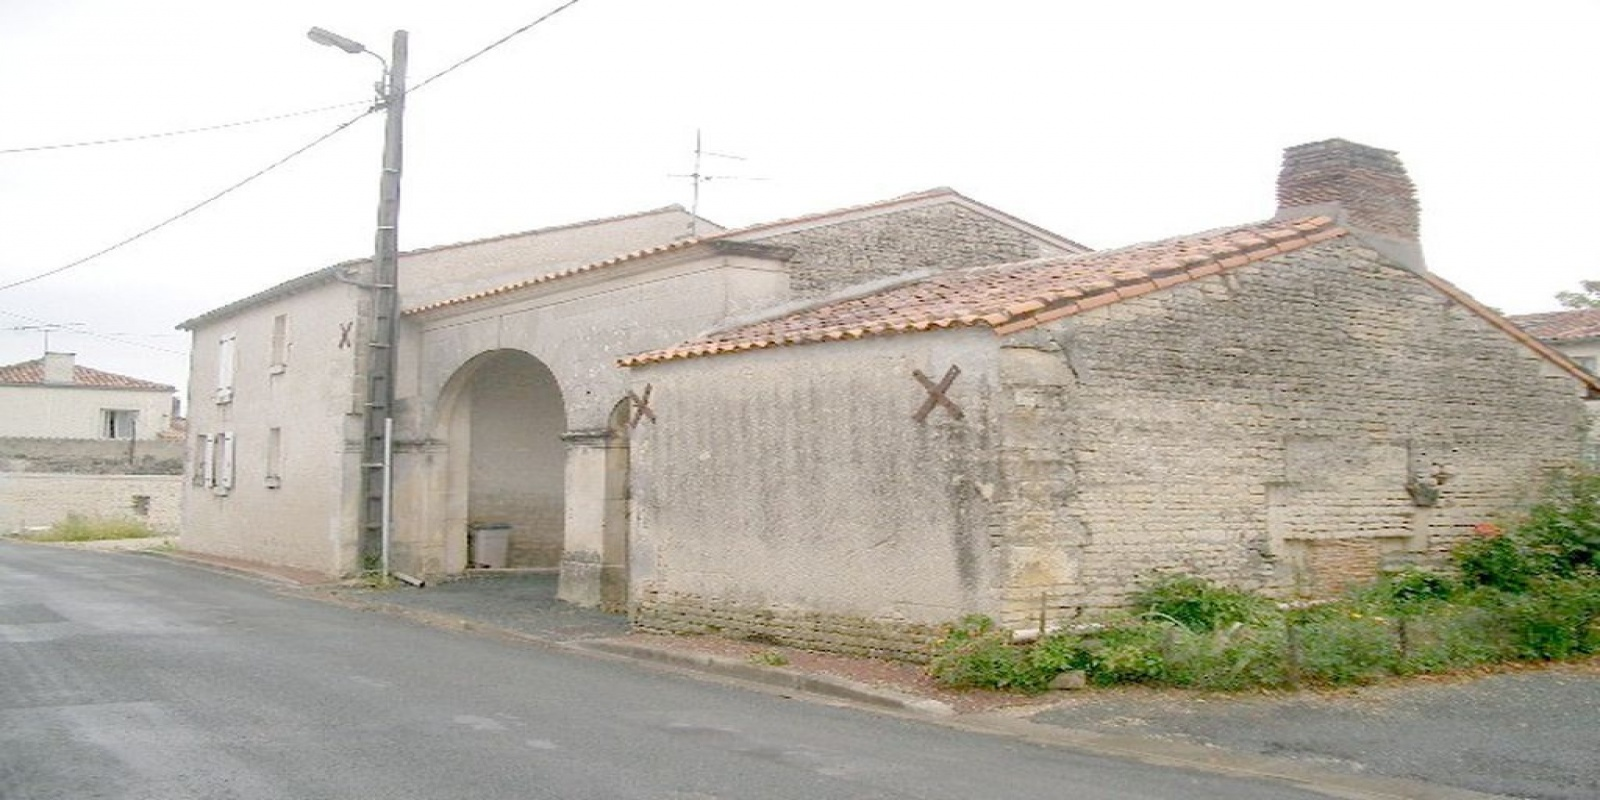 Pavillon, A louer, Listing ID undefined, SONNAC, France, 17160,